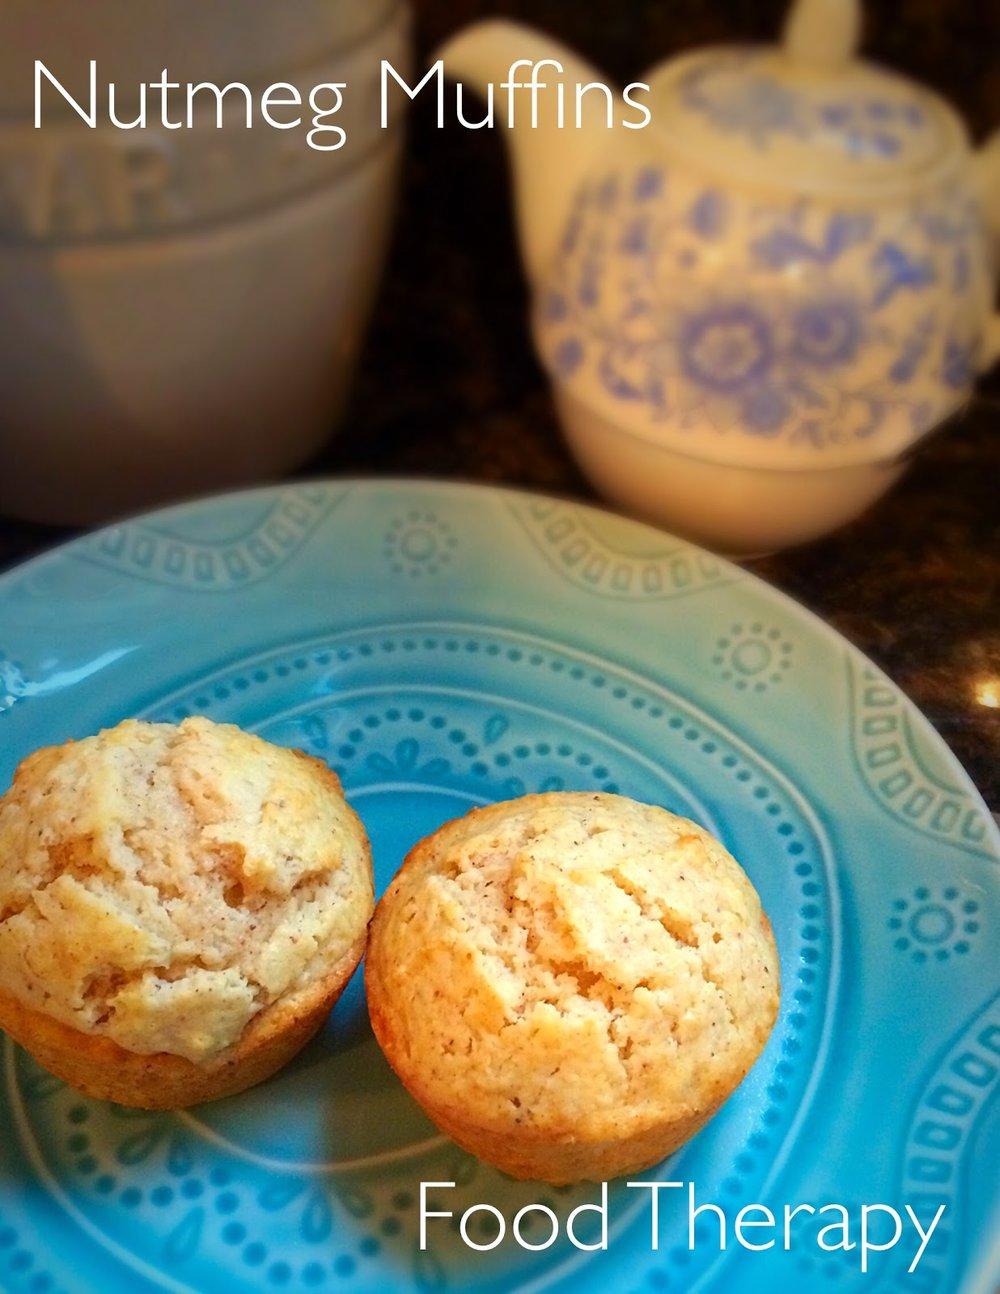 Nutmeg Muffins